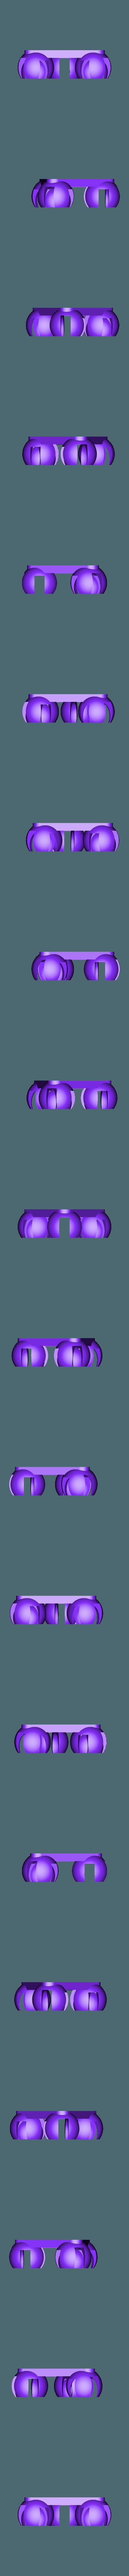 Main Base x 1.stl Download free STL file Adjustable Tripod (FULLY 3D PRINTED) • 3D printing design, samsuchin